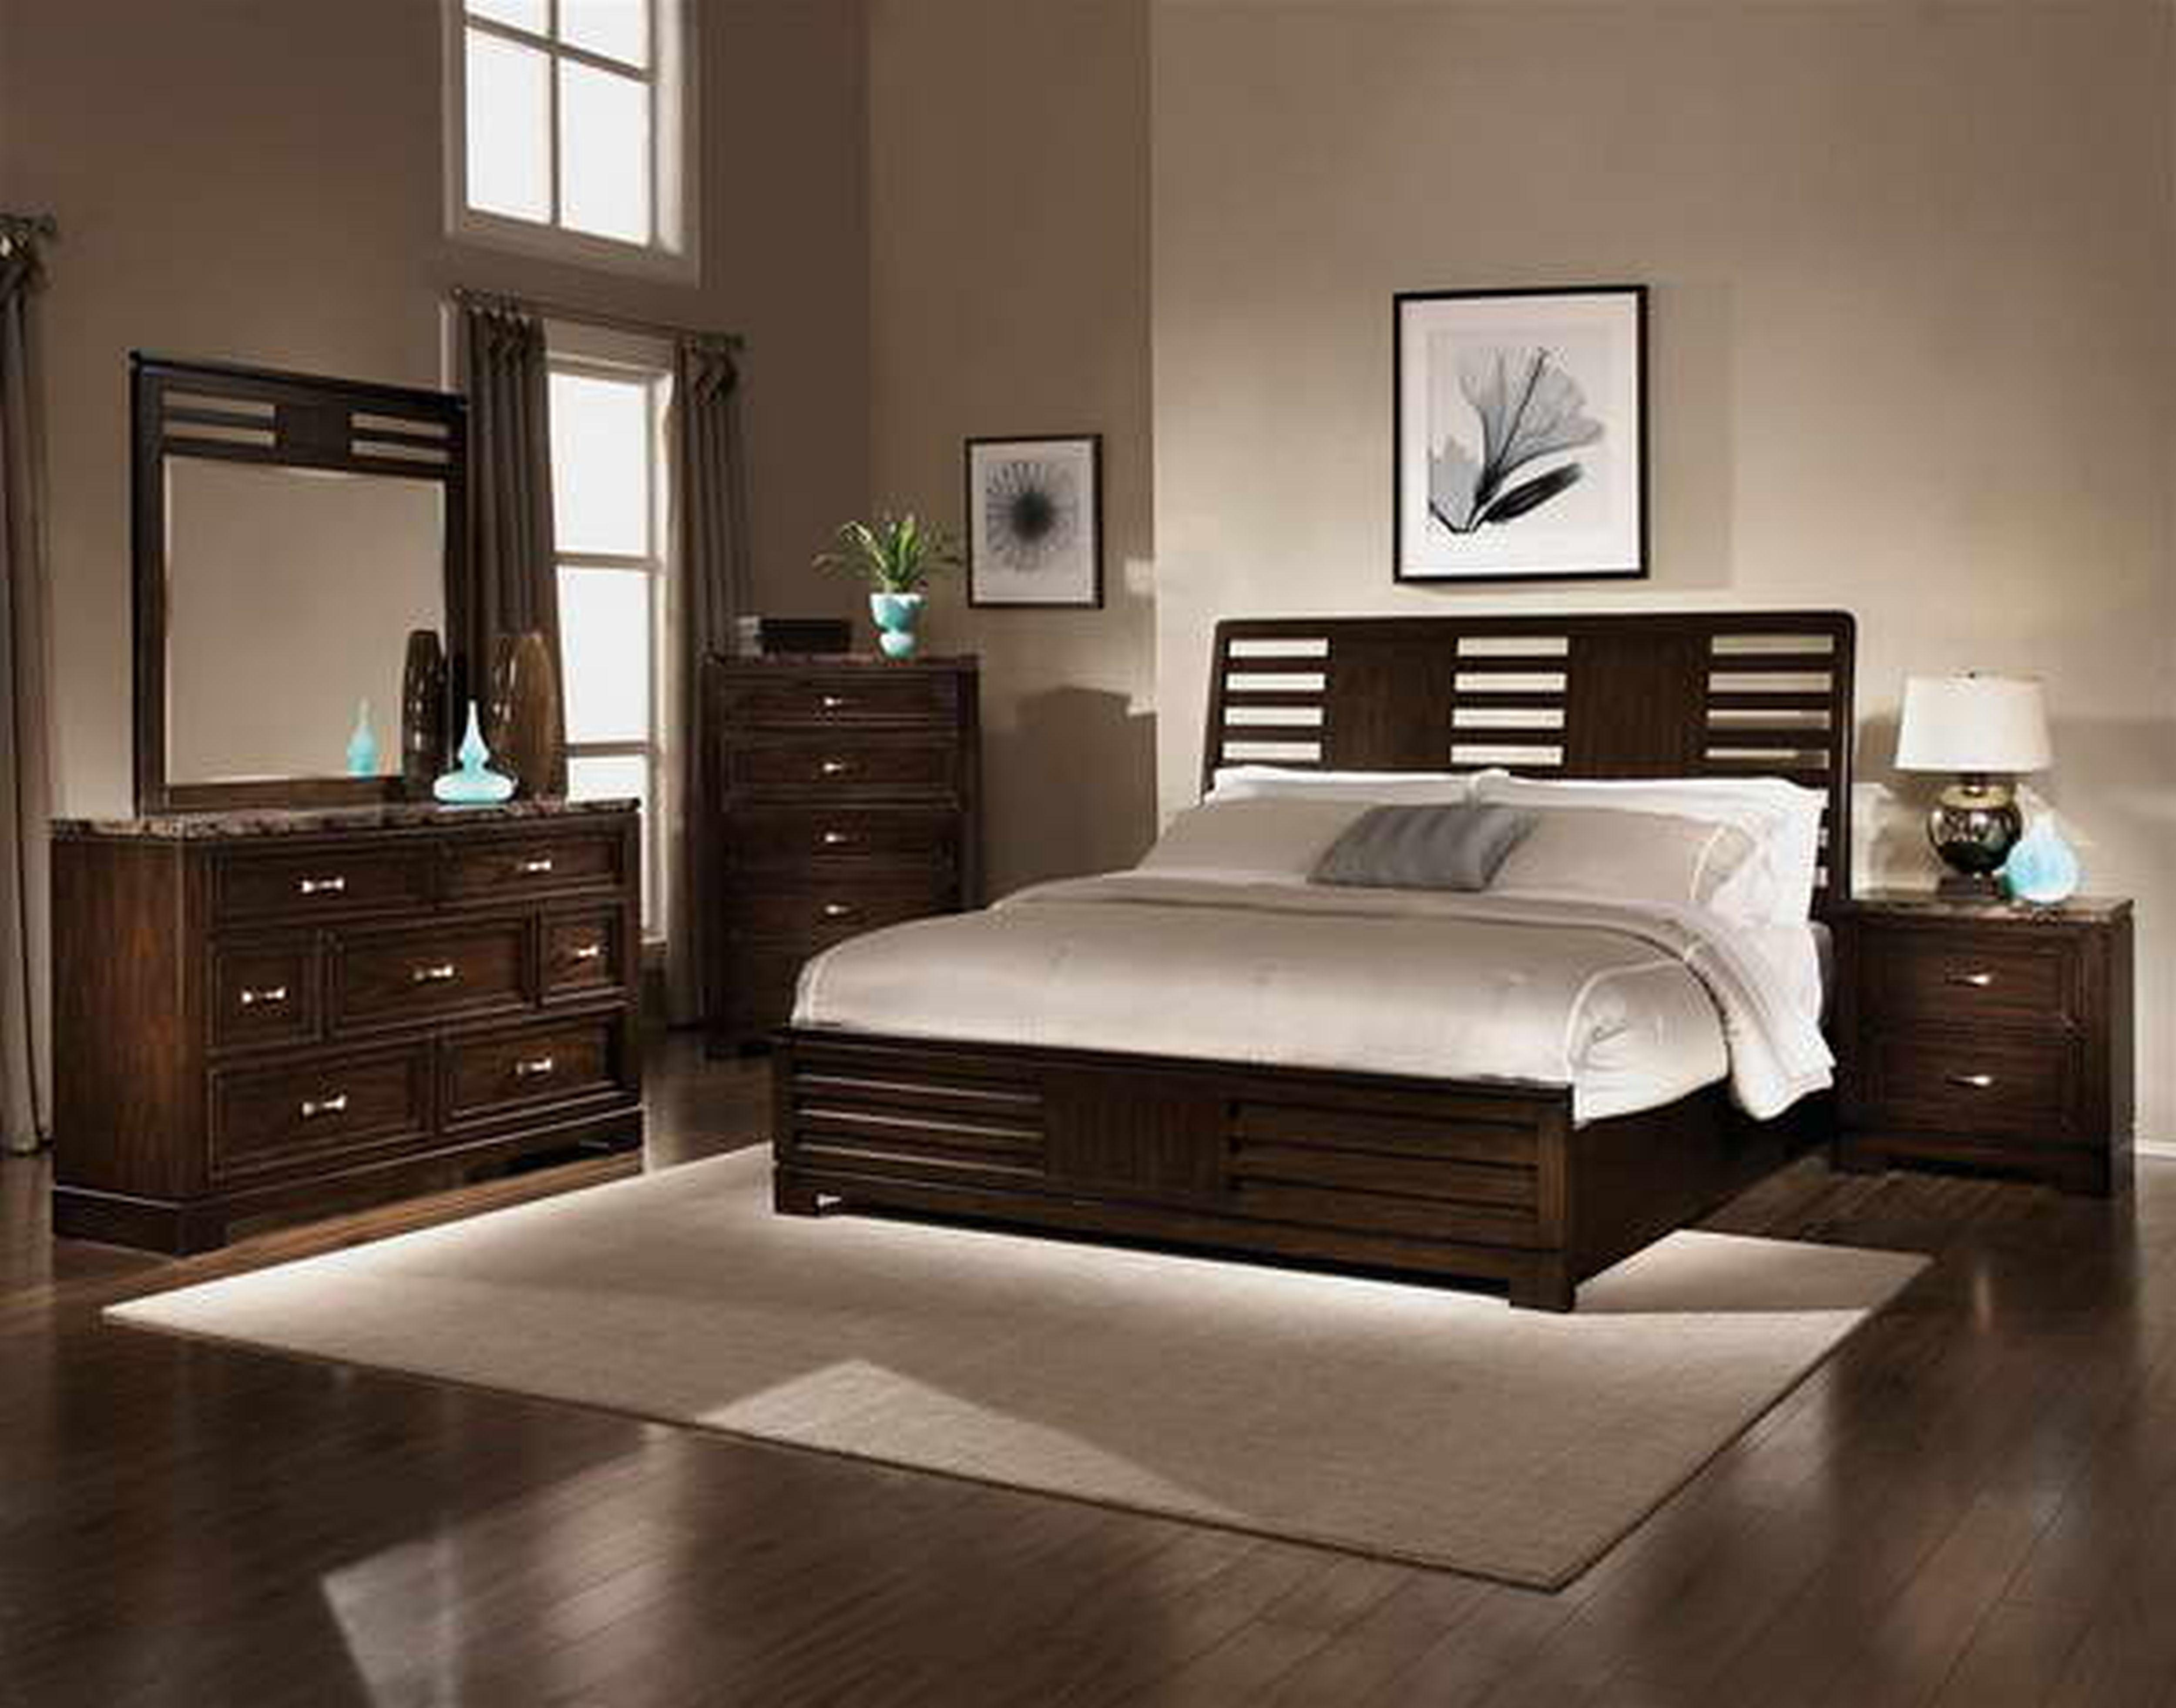 Fancy Most Relaxing Bedroom Paint Color 3363